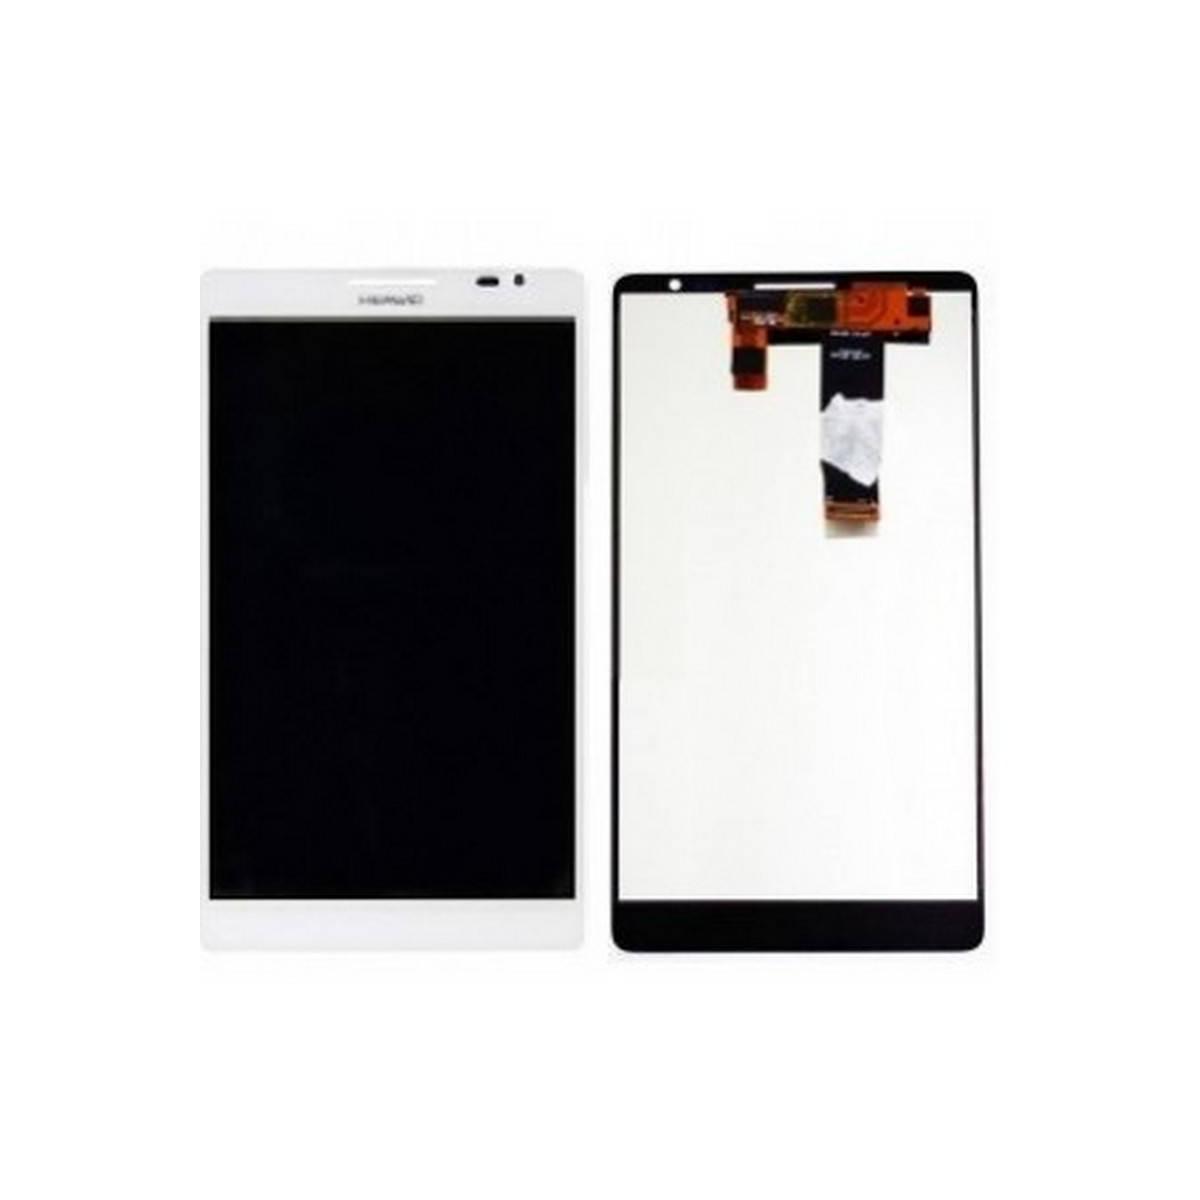 Pantalla completa blanca para Huawei Ascend Mate, MT1-U06